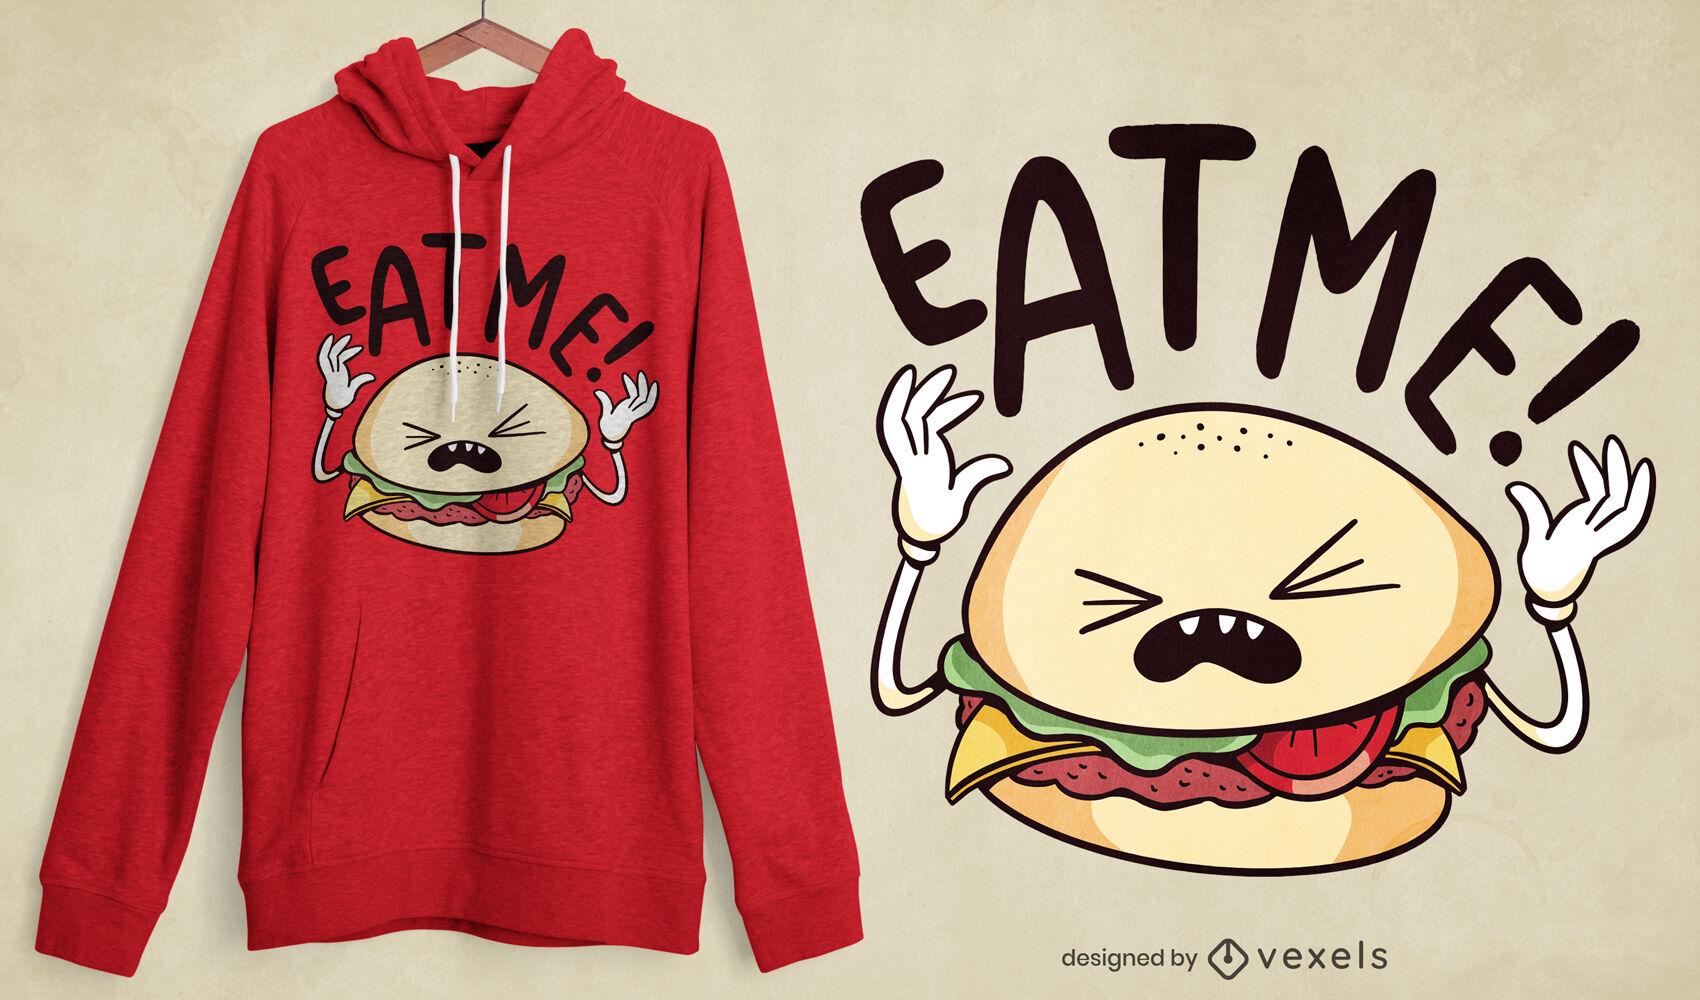 Cómeme diseño de camiseta de personaje de hamburguesa.